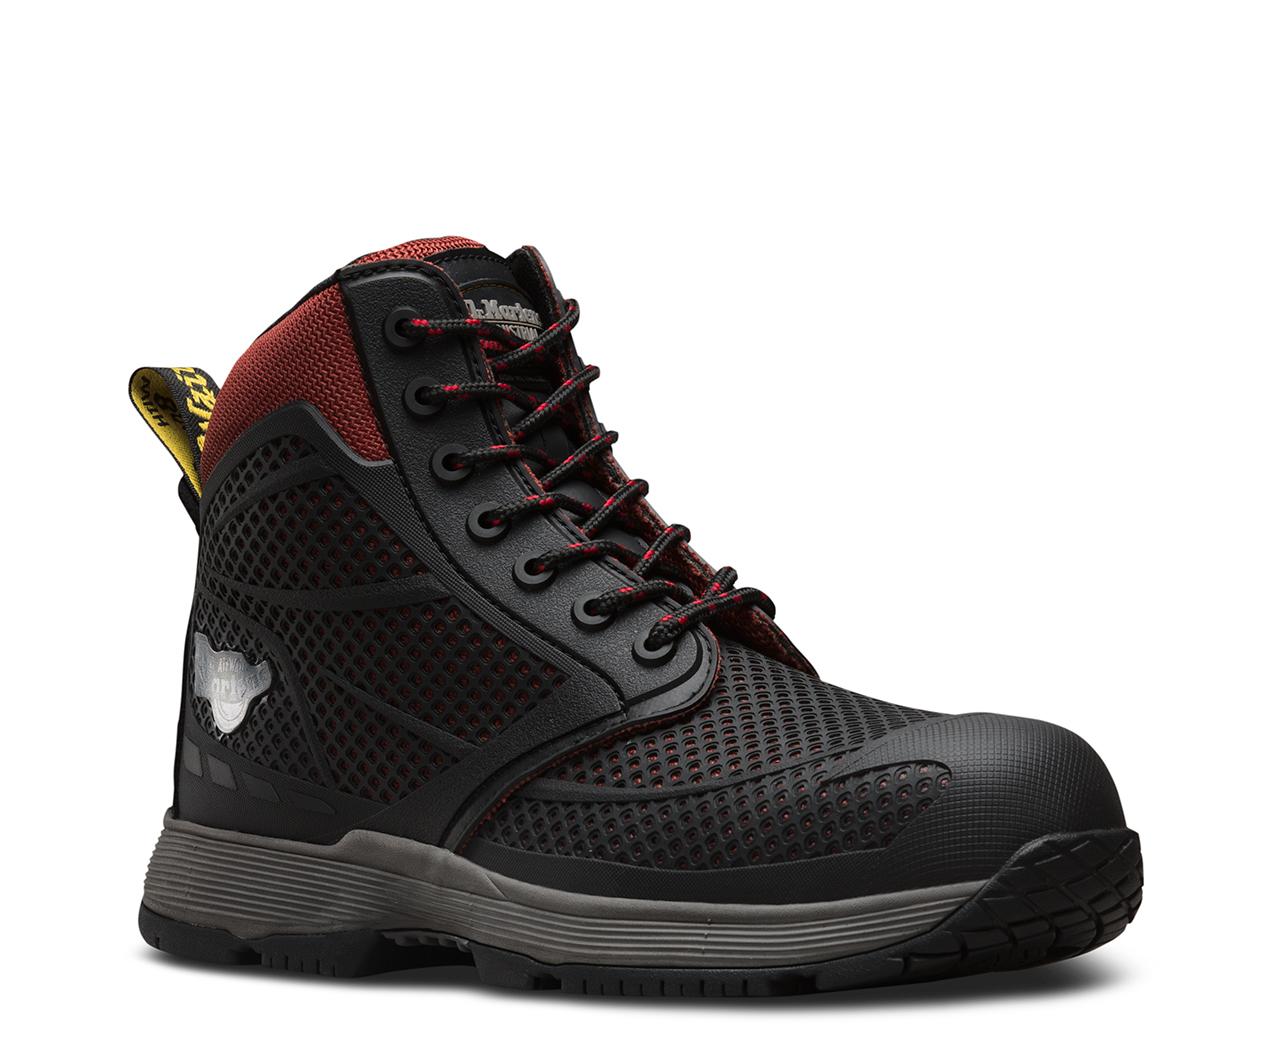 c30450ed7b1 Details about Dr Martens Calamus Composite Toe Cap Metal Free Lightweight  Safety Boots Oxblood